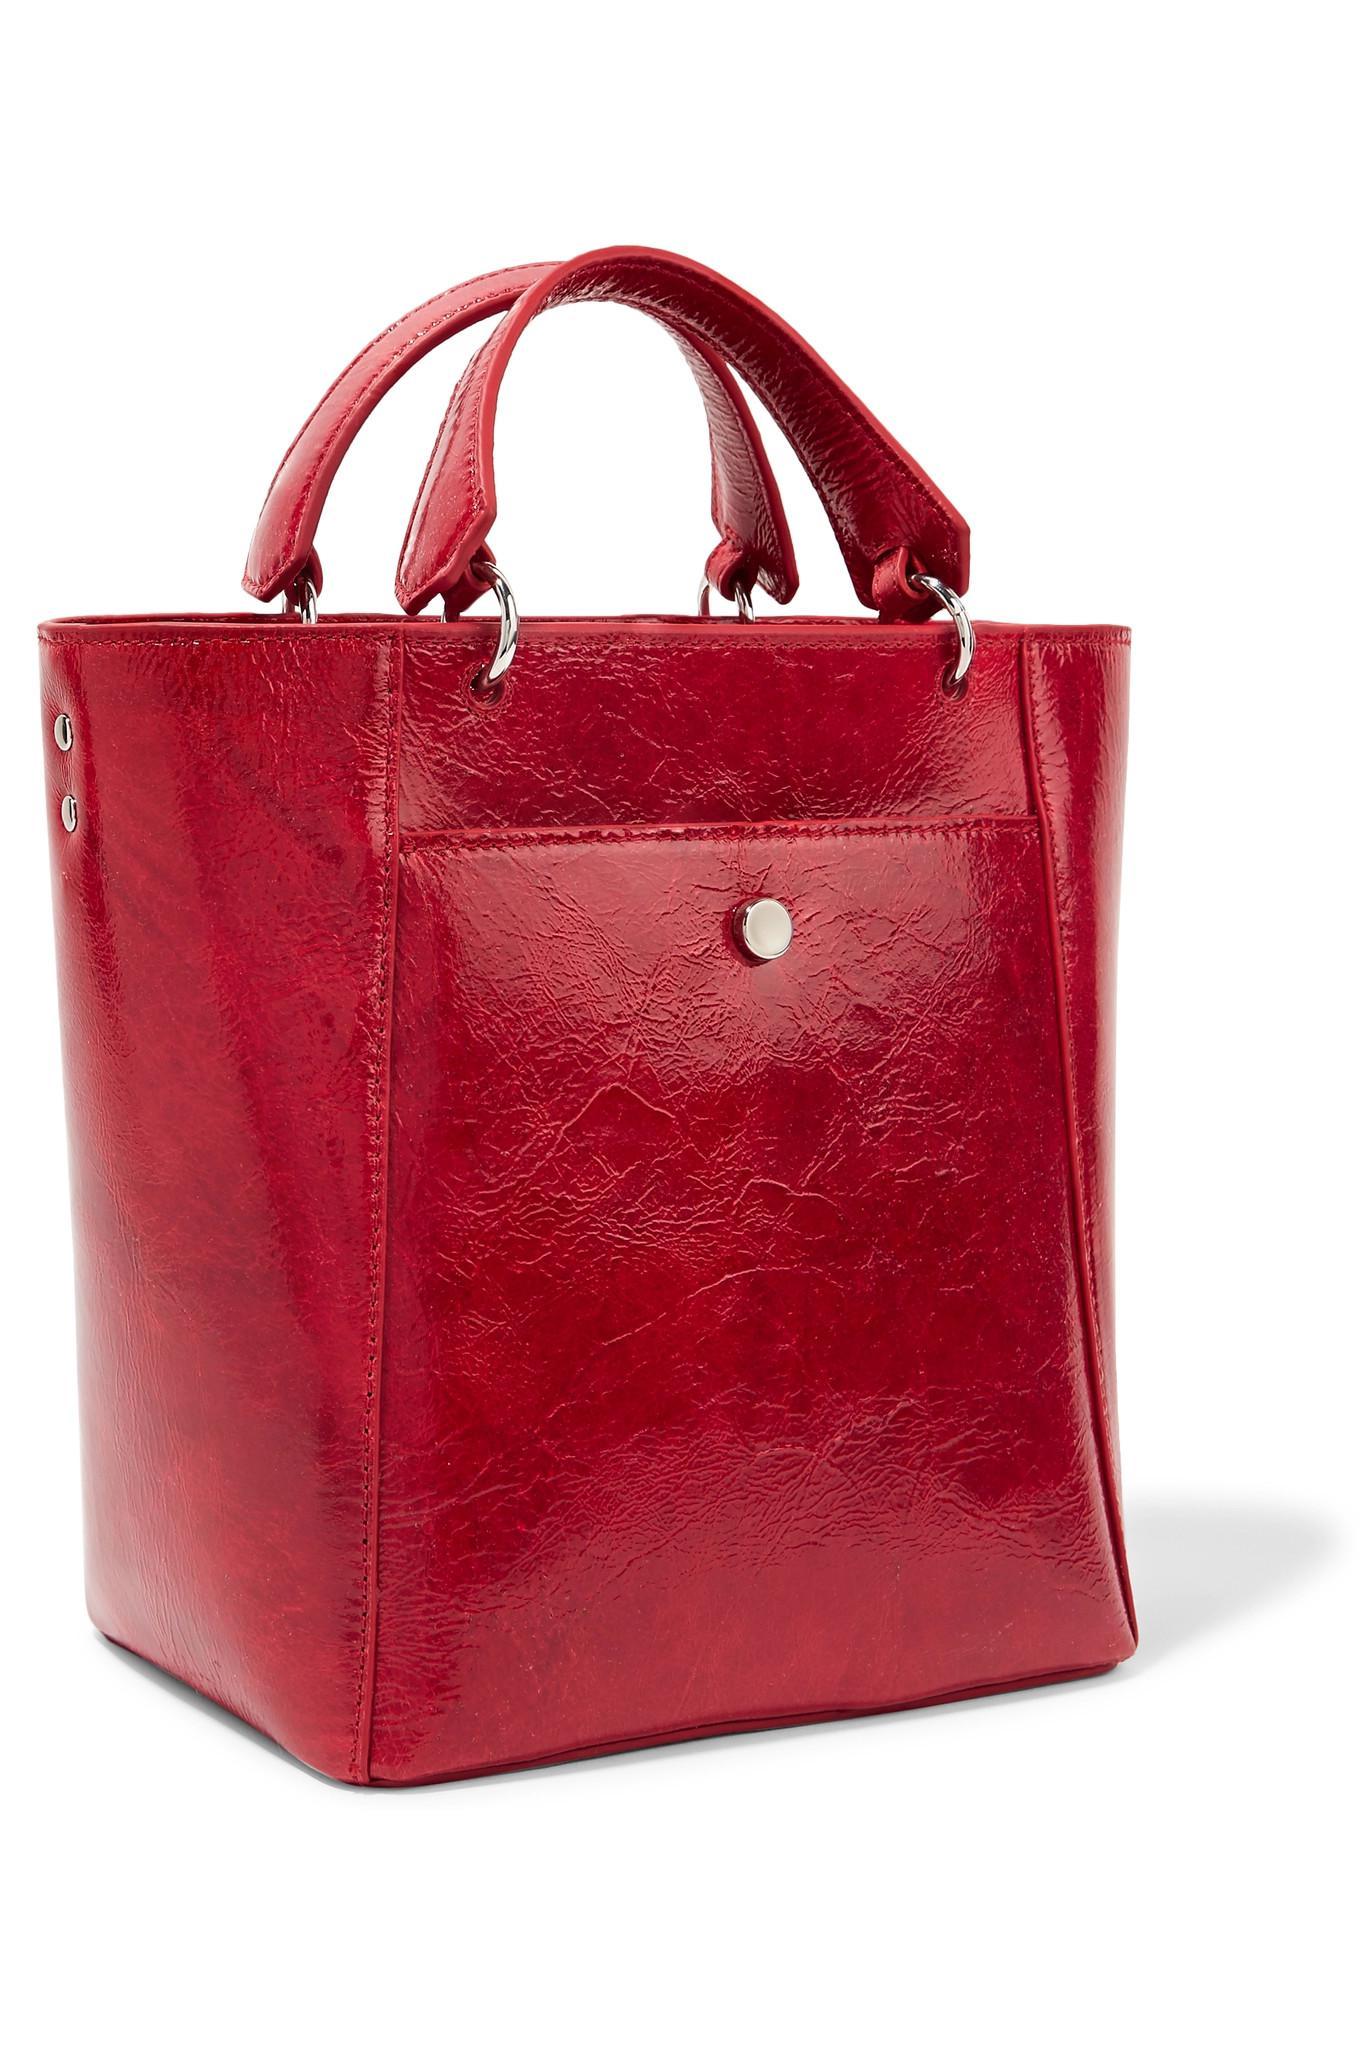 Eloise Small Faux Patent Textured-leather Tote - Black Elizabeth & James FXlDs